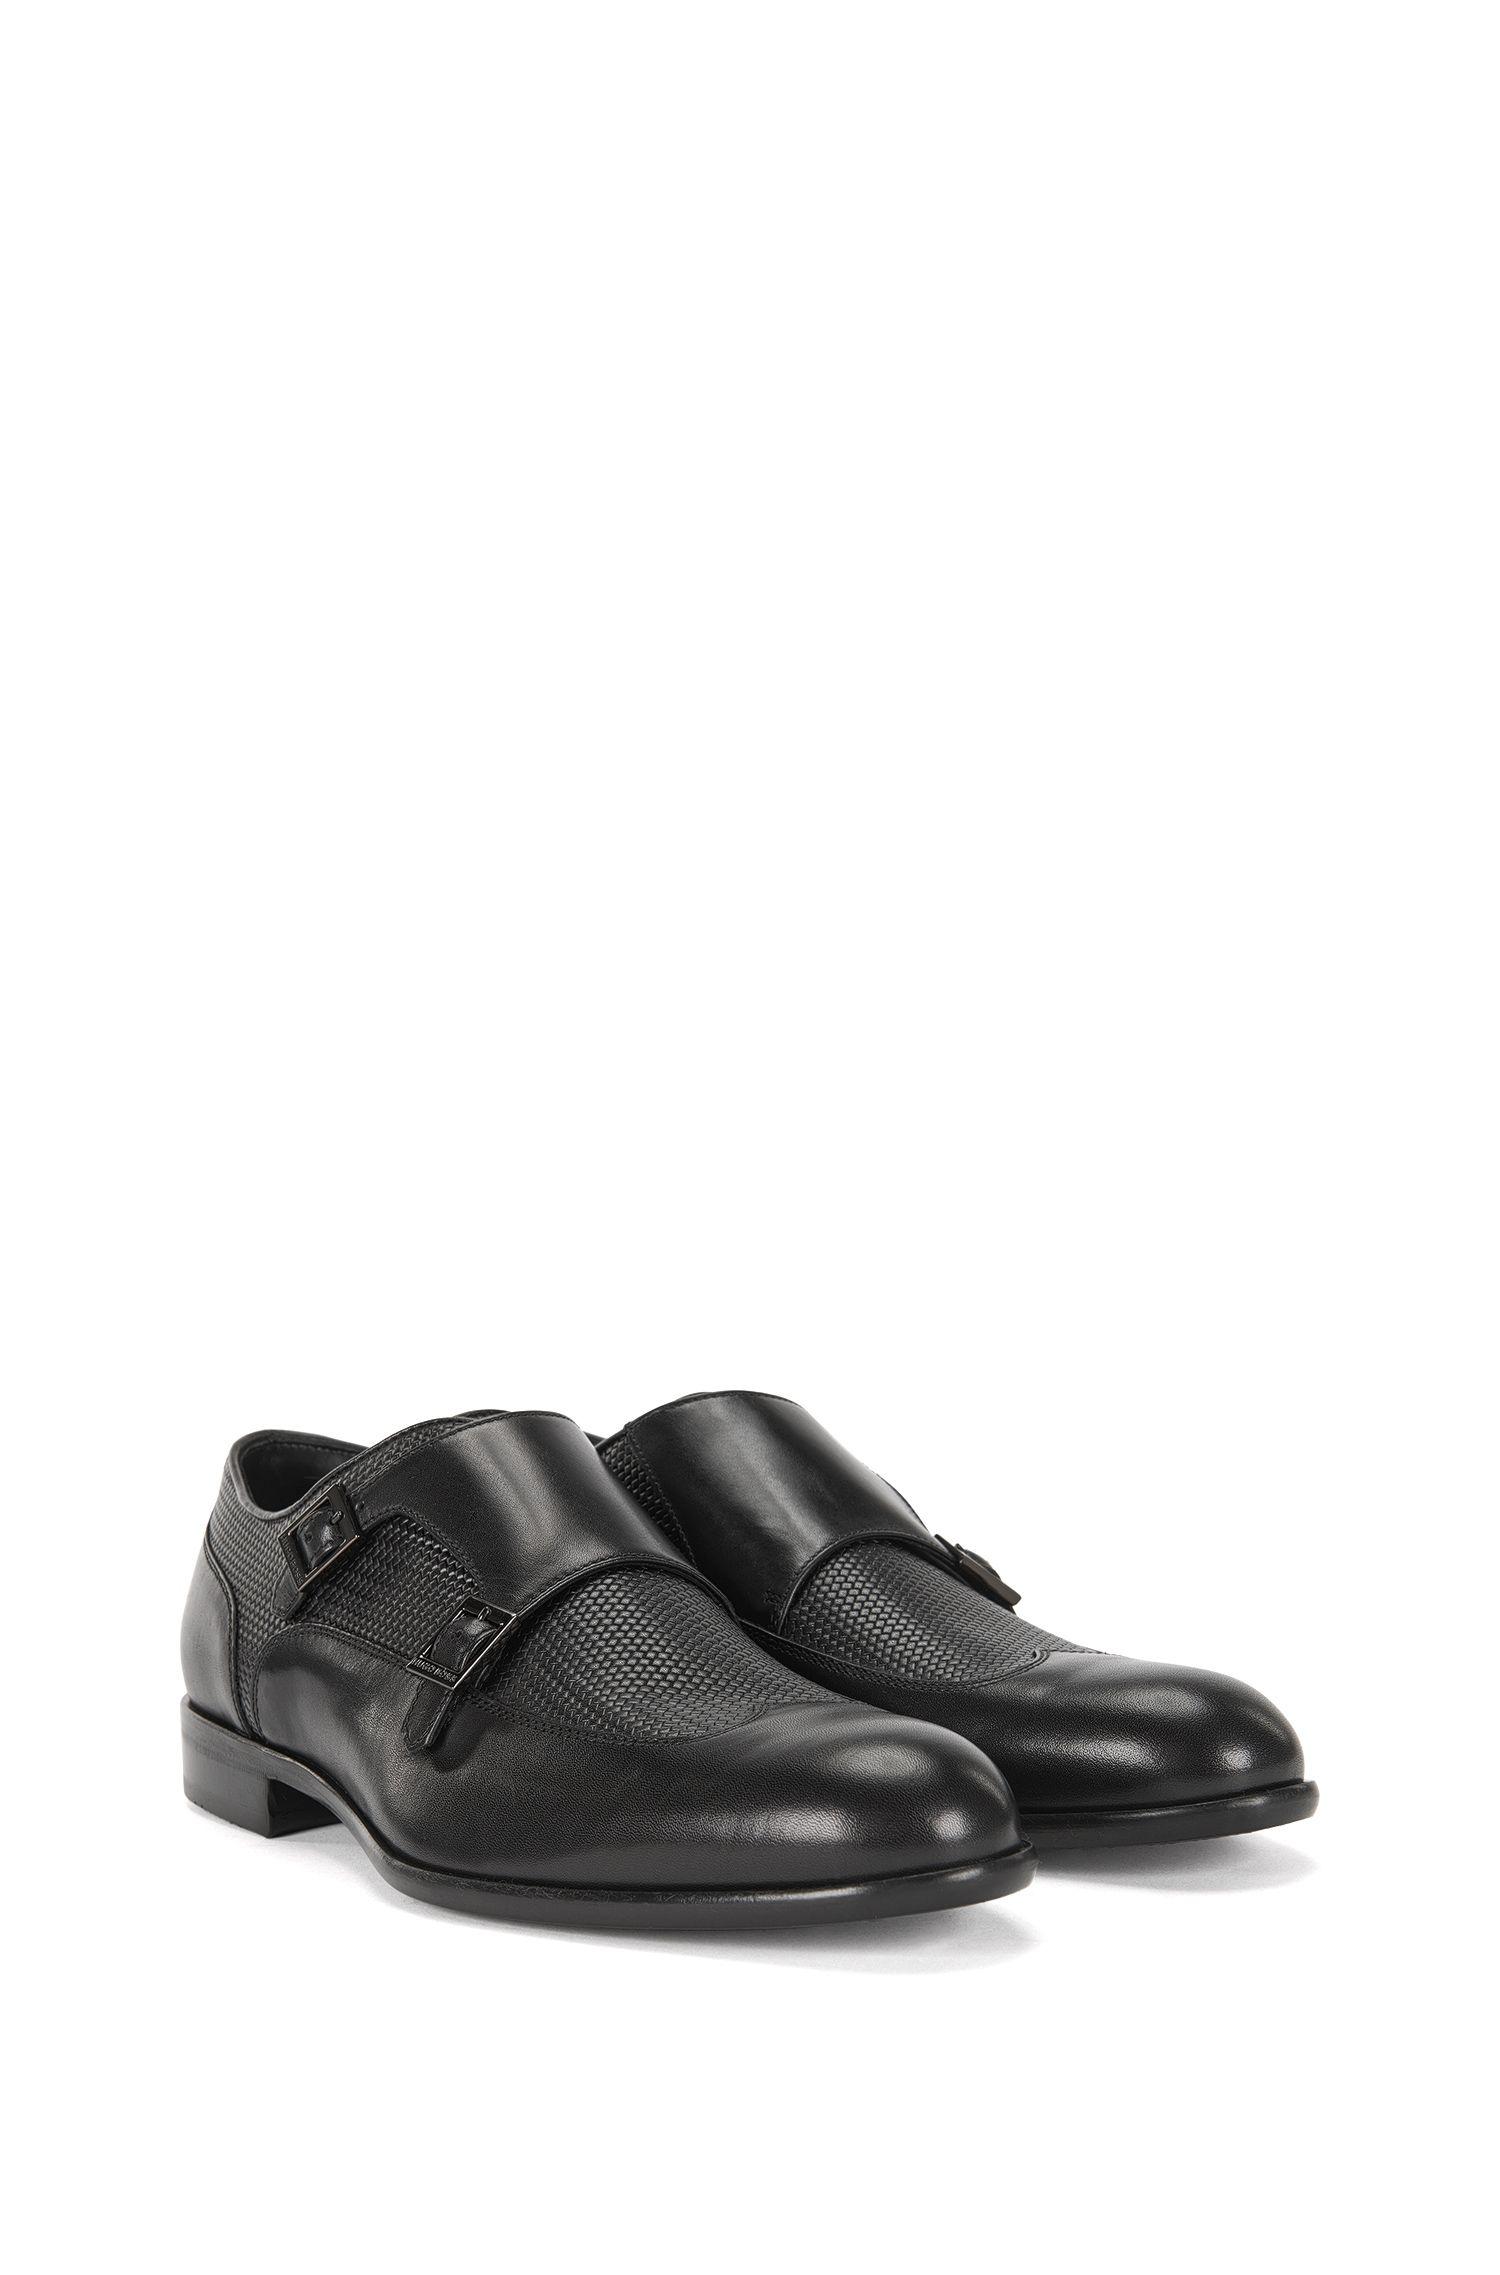 'Manmok' | Italian Calfskin Double Monk Strap Dress Shoes